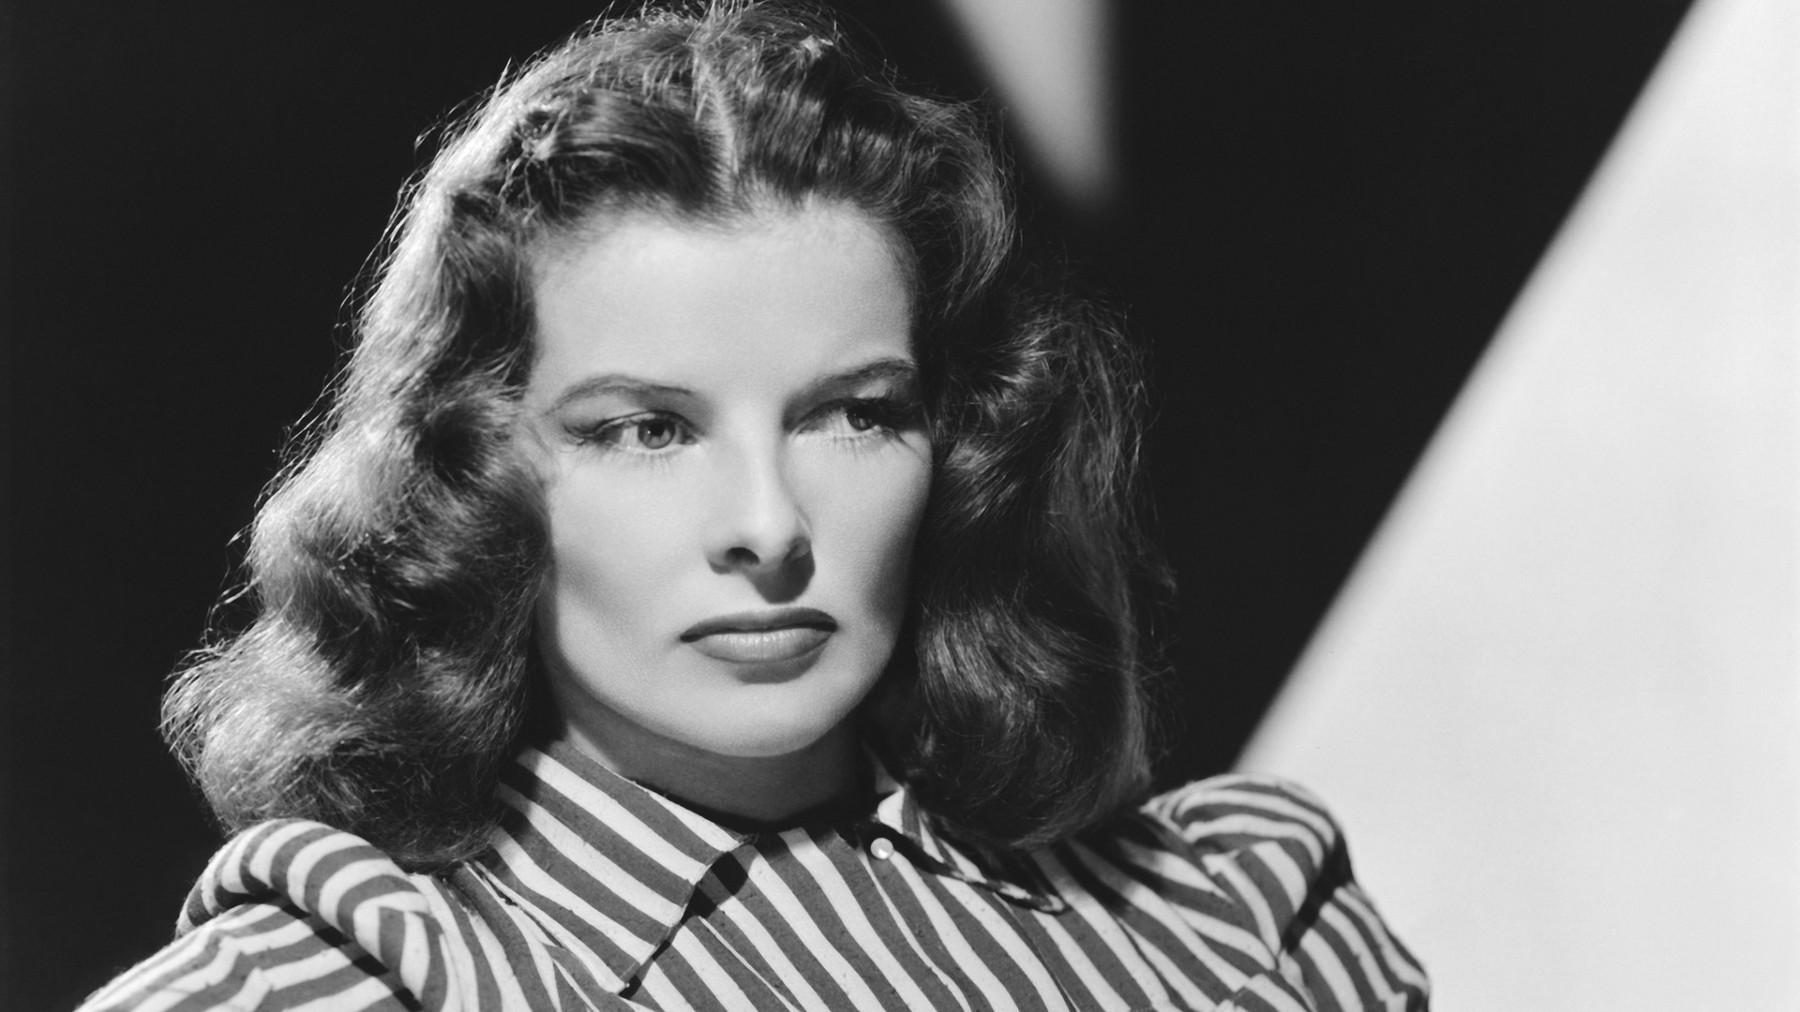 [CINEMA] Hollywood: Confronto ao ideal feminino